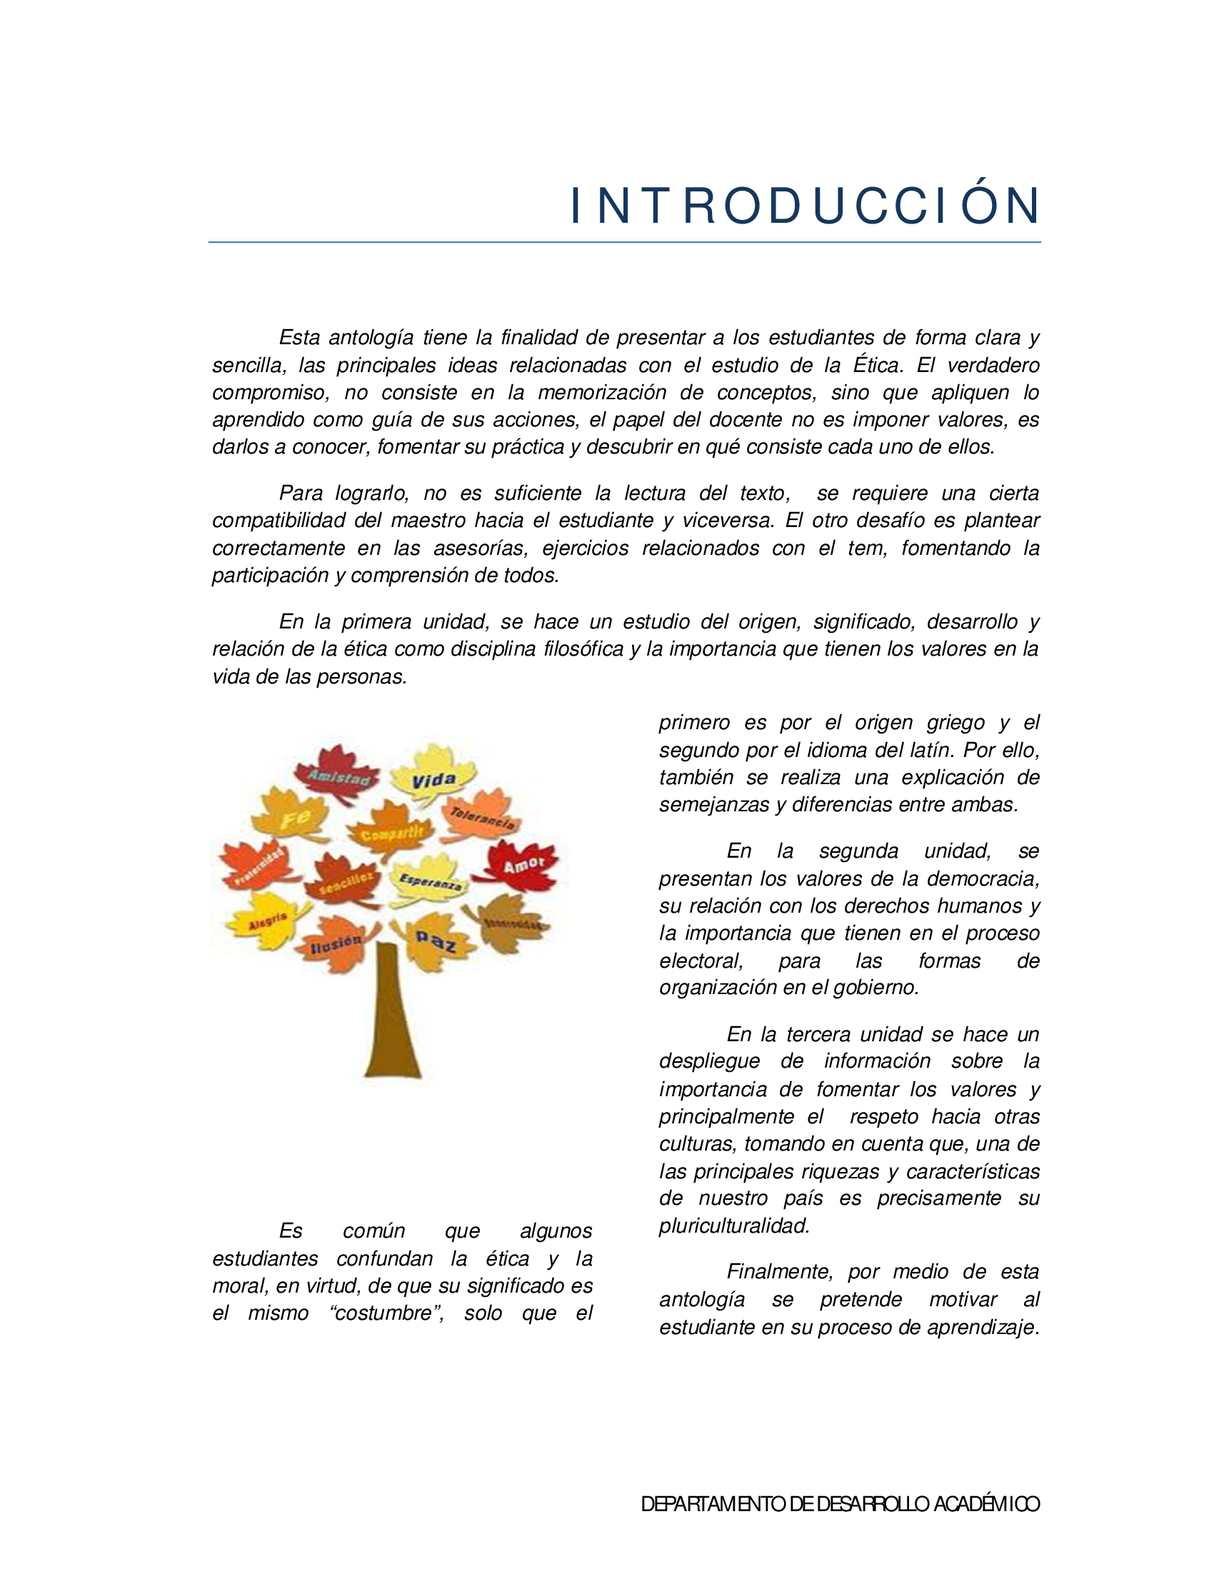 The Handbook of West European